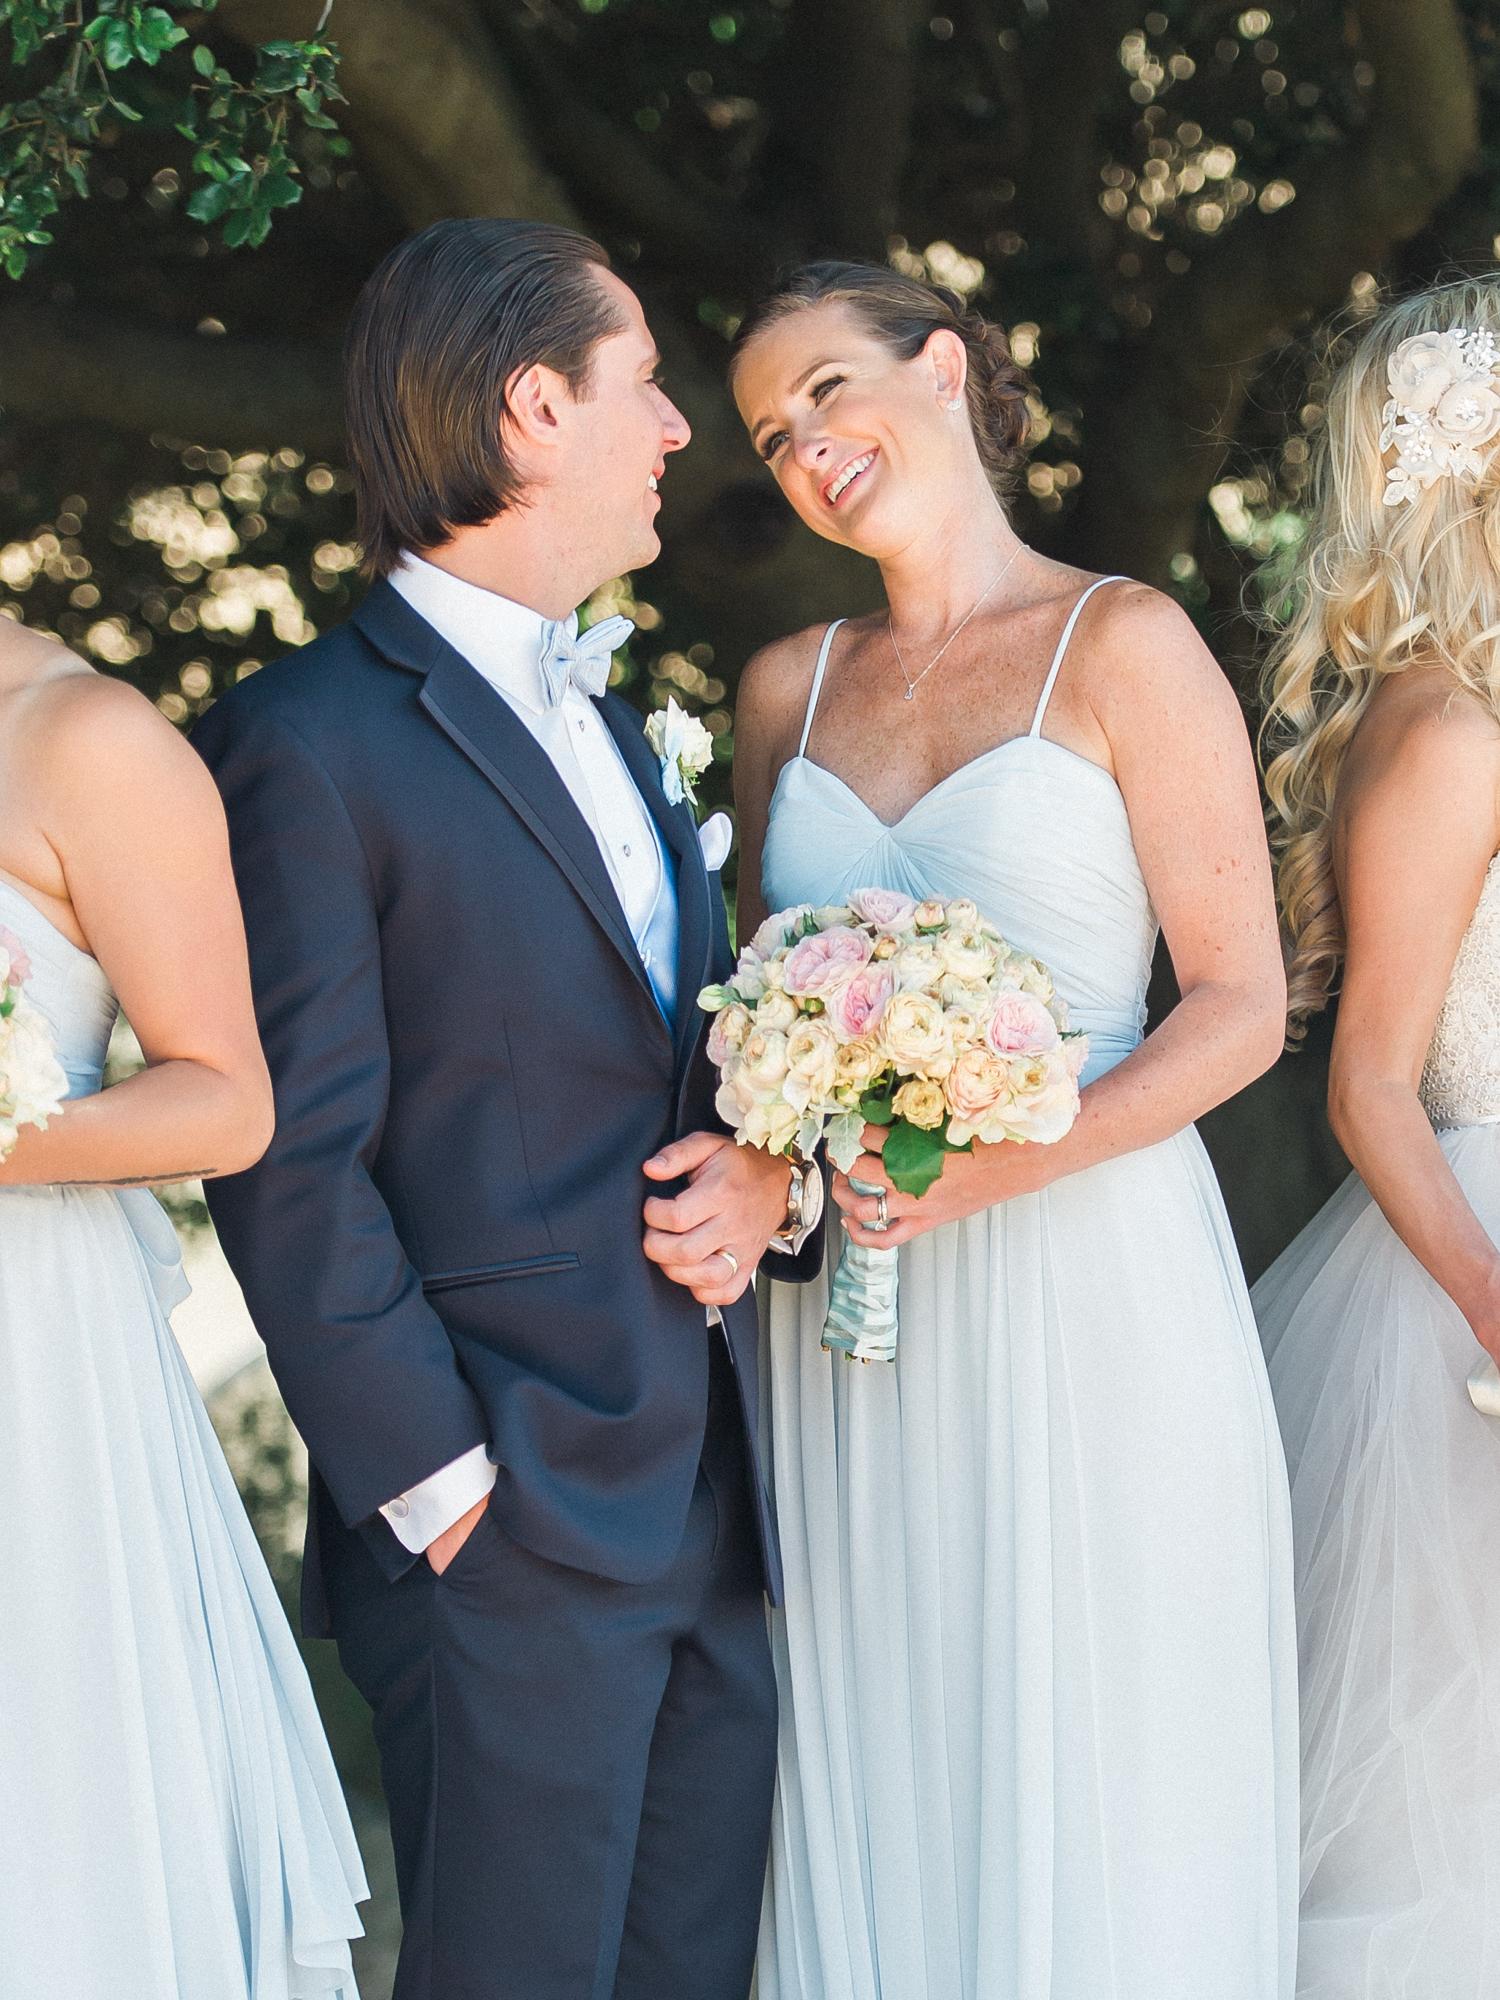 Aimee+Logan_wedding_spp-55.jpg